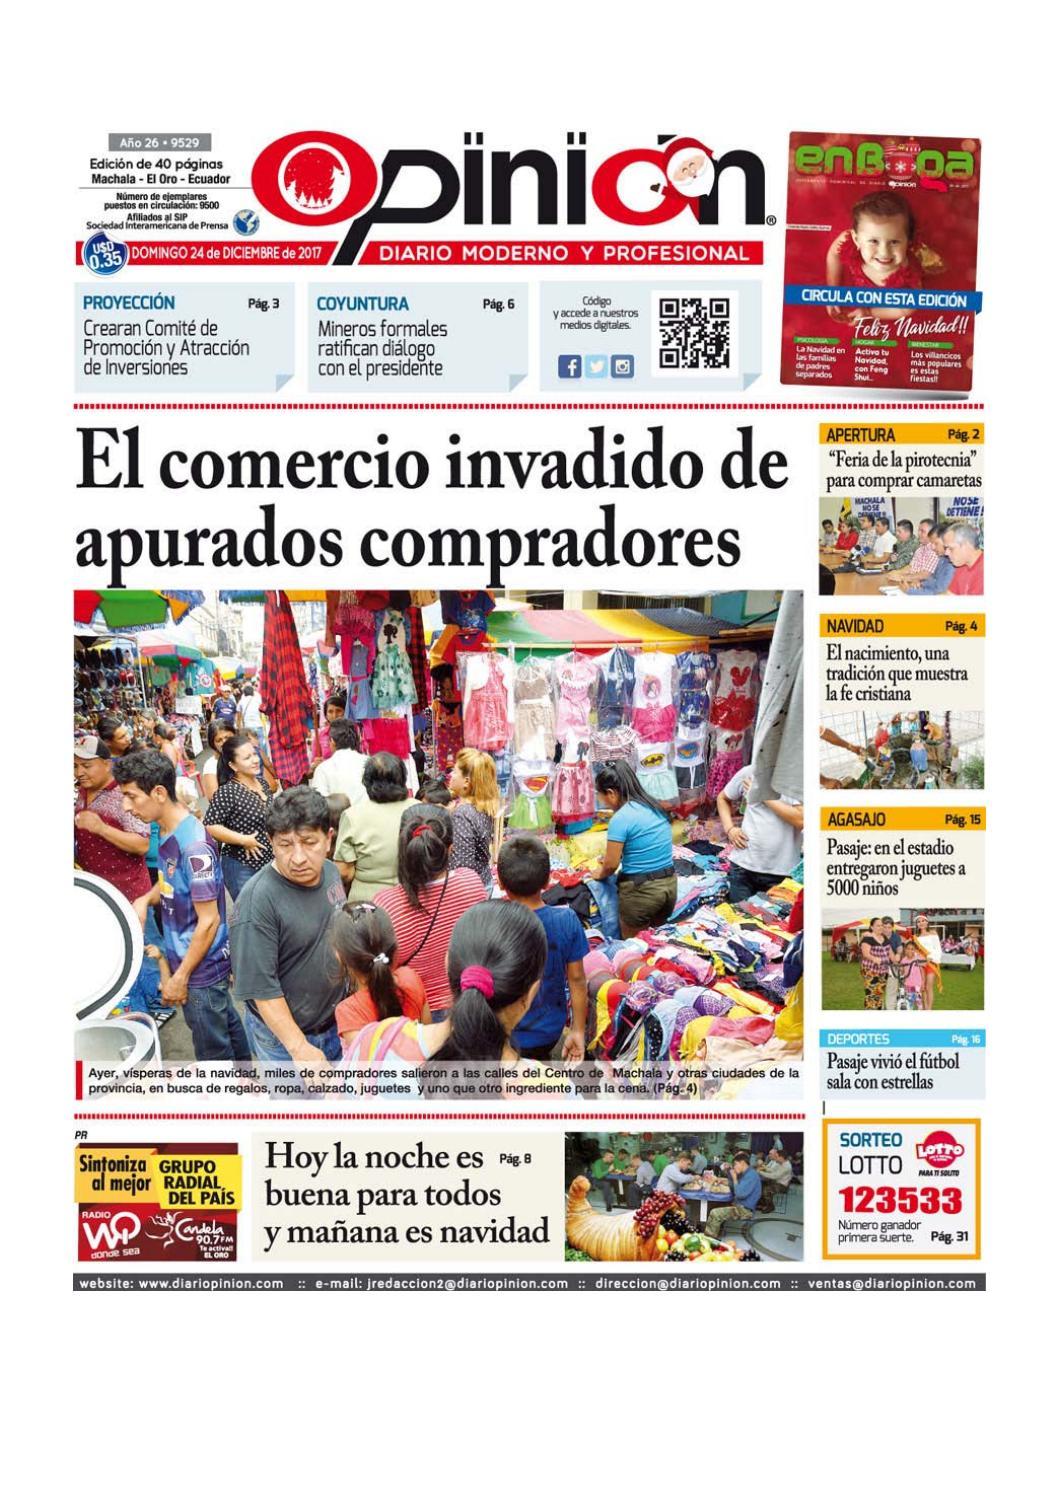 Impreso 24 12 17 by Diario Opinion - issuu